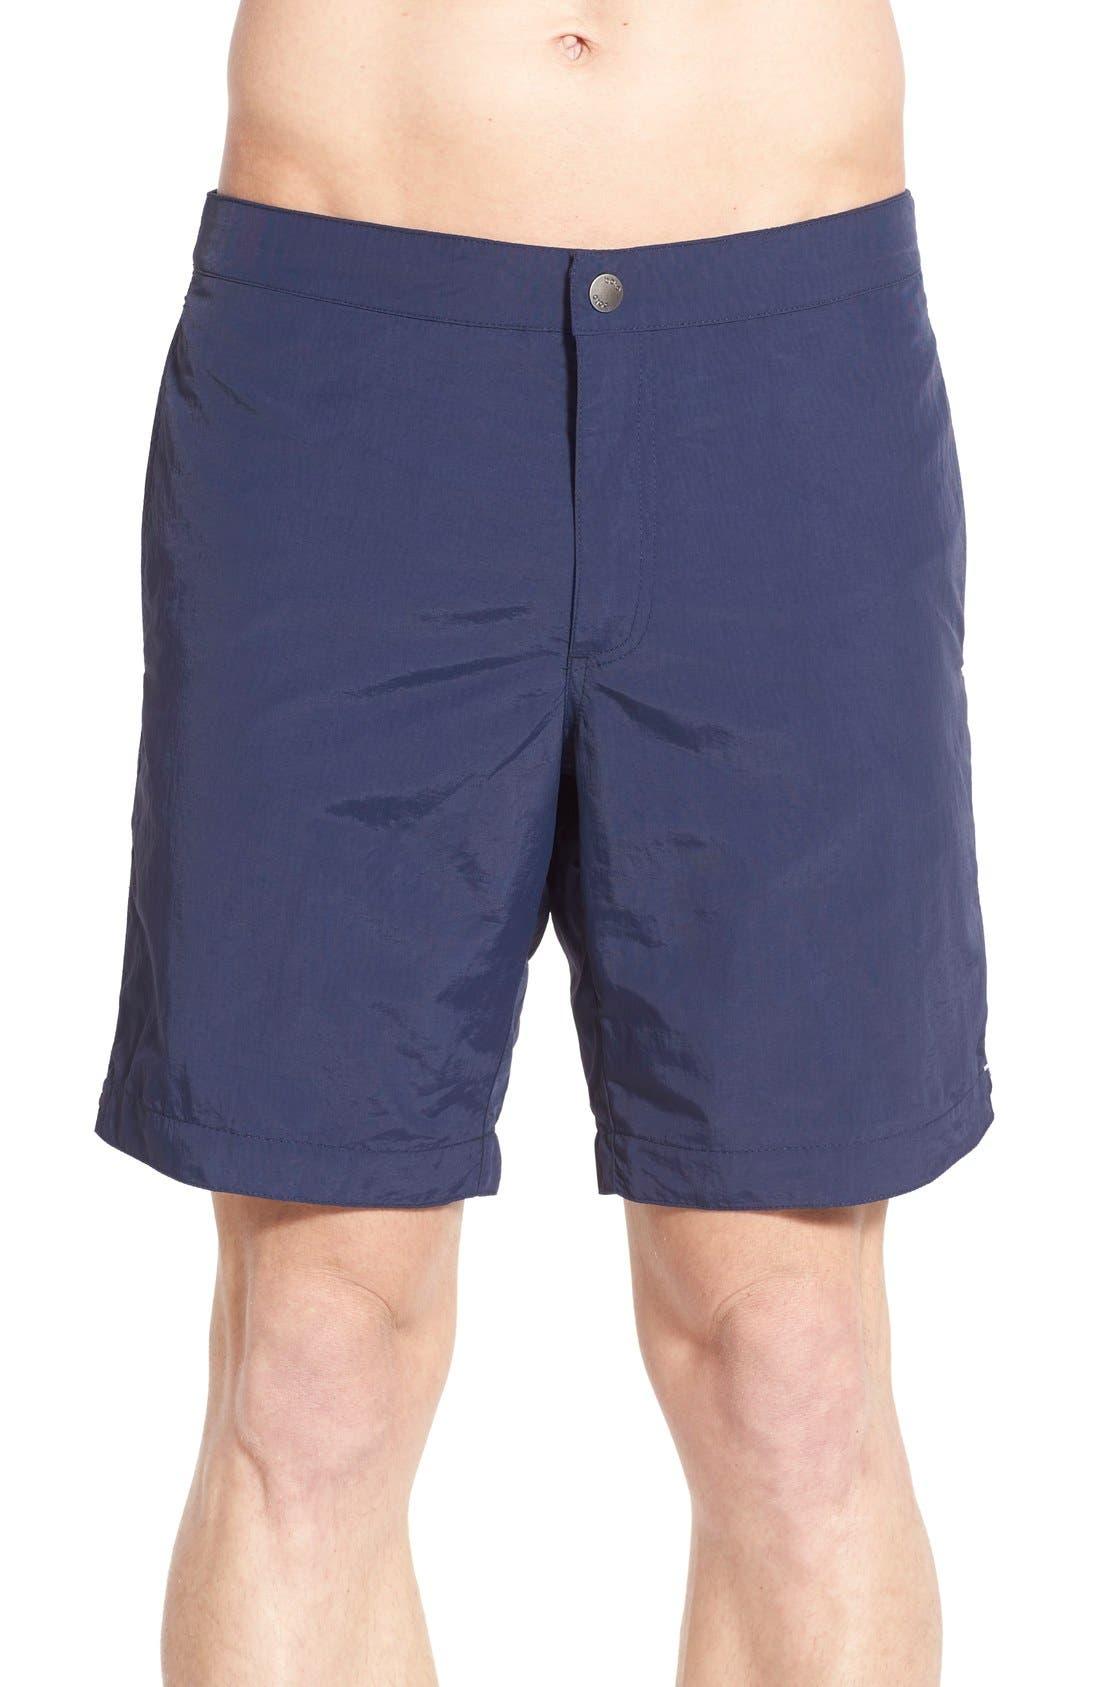 Aruba Tailored Fit 8.5 Inch Swim Trunks,                             Main thumbnail 1, color,                             415